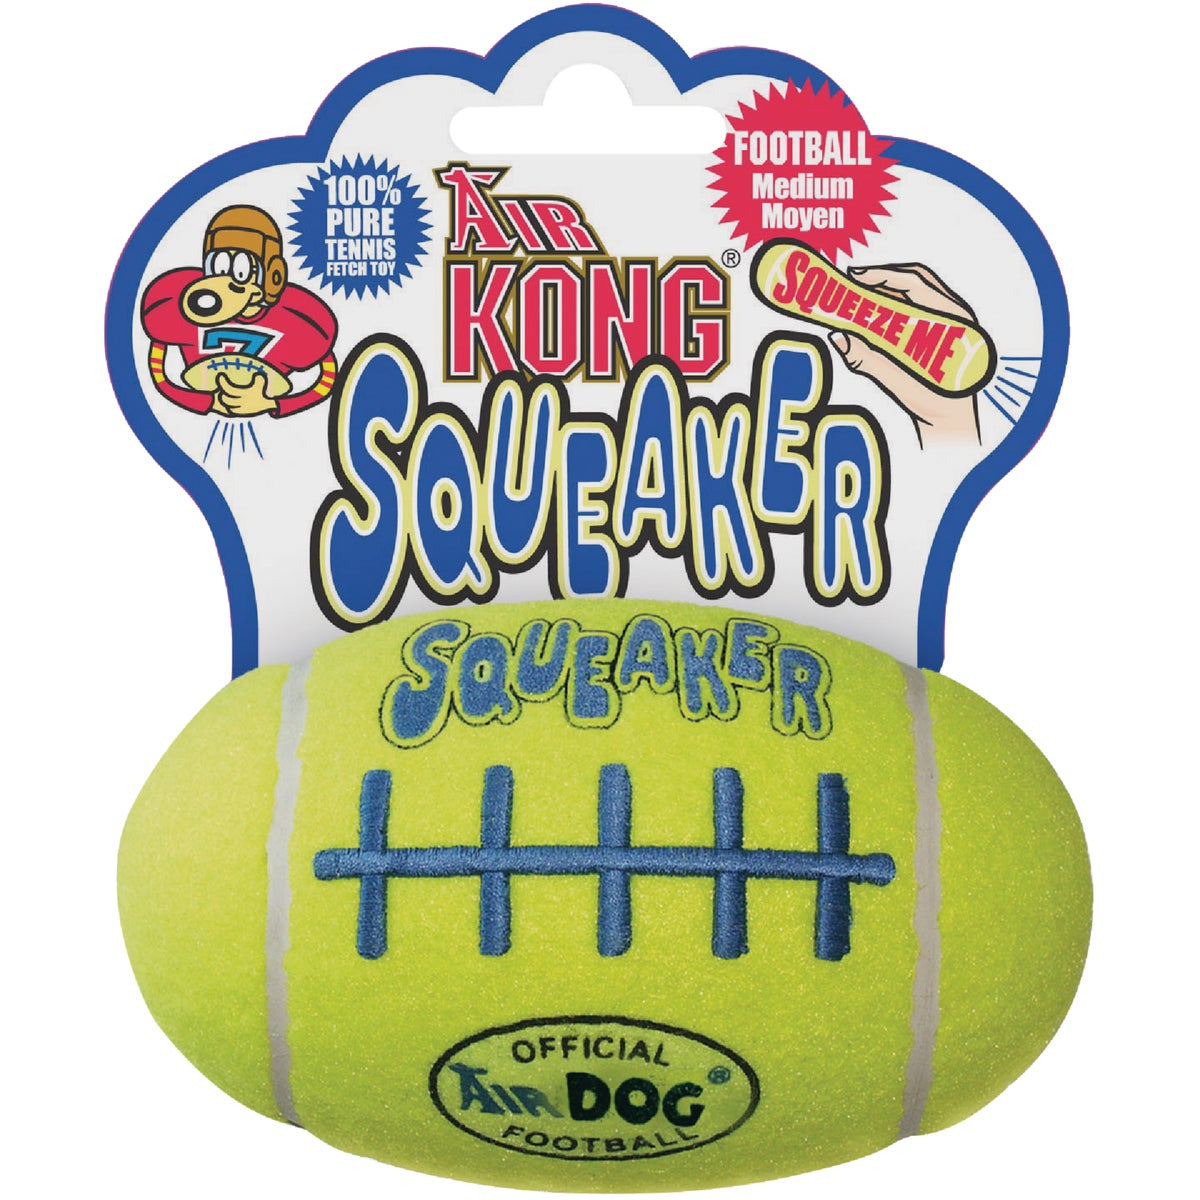 KONG Air Dog Squeaker Football Dog Toy, Medium, Yellow